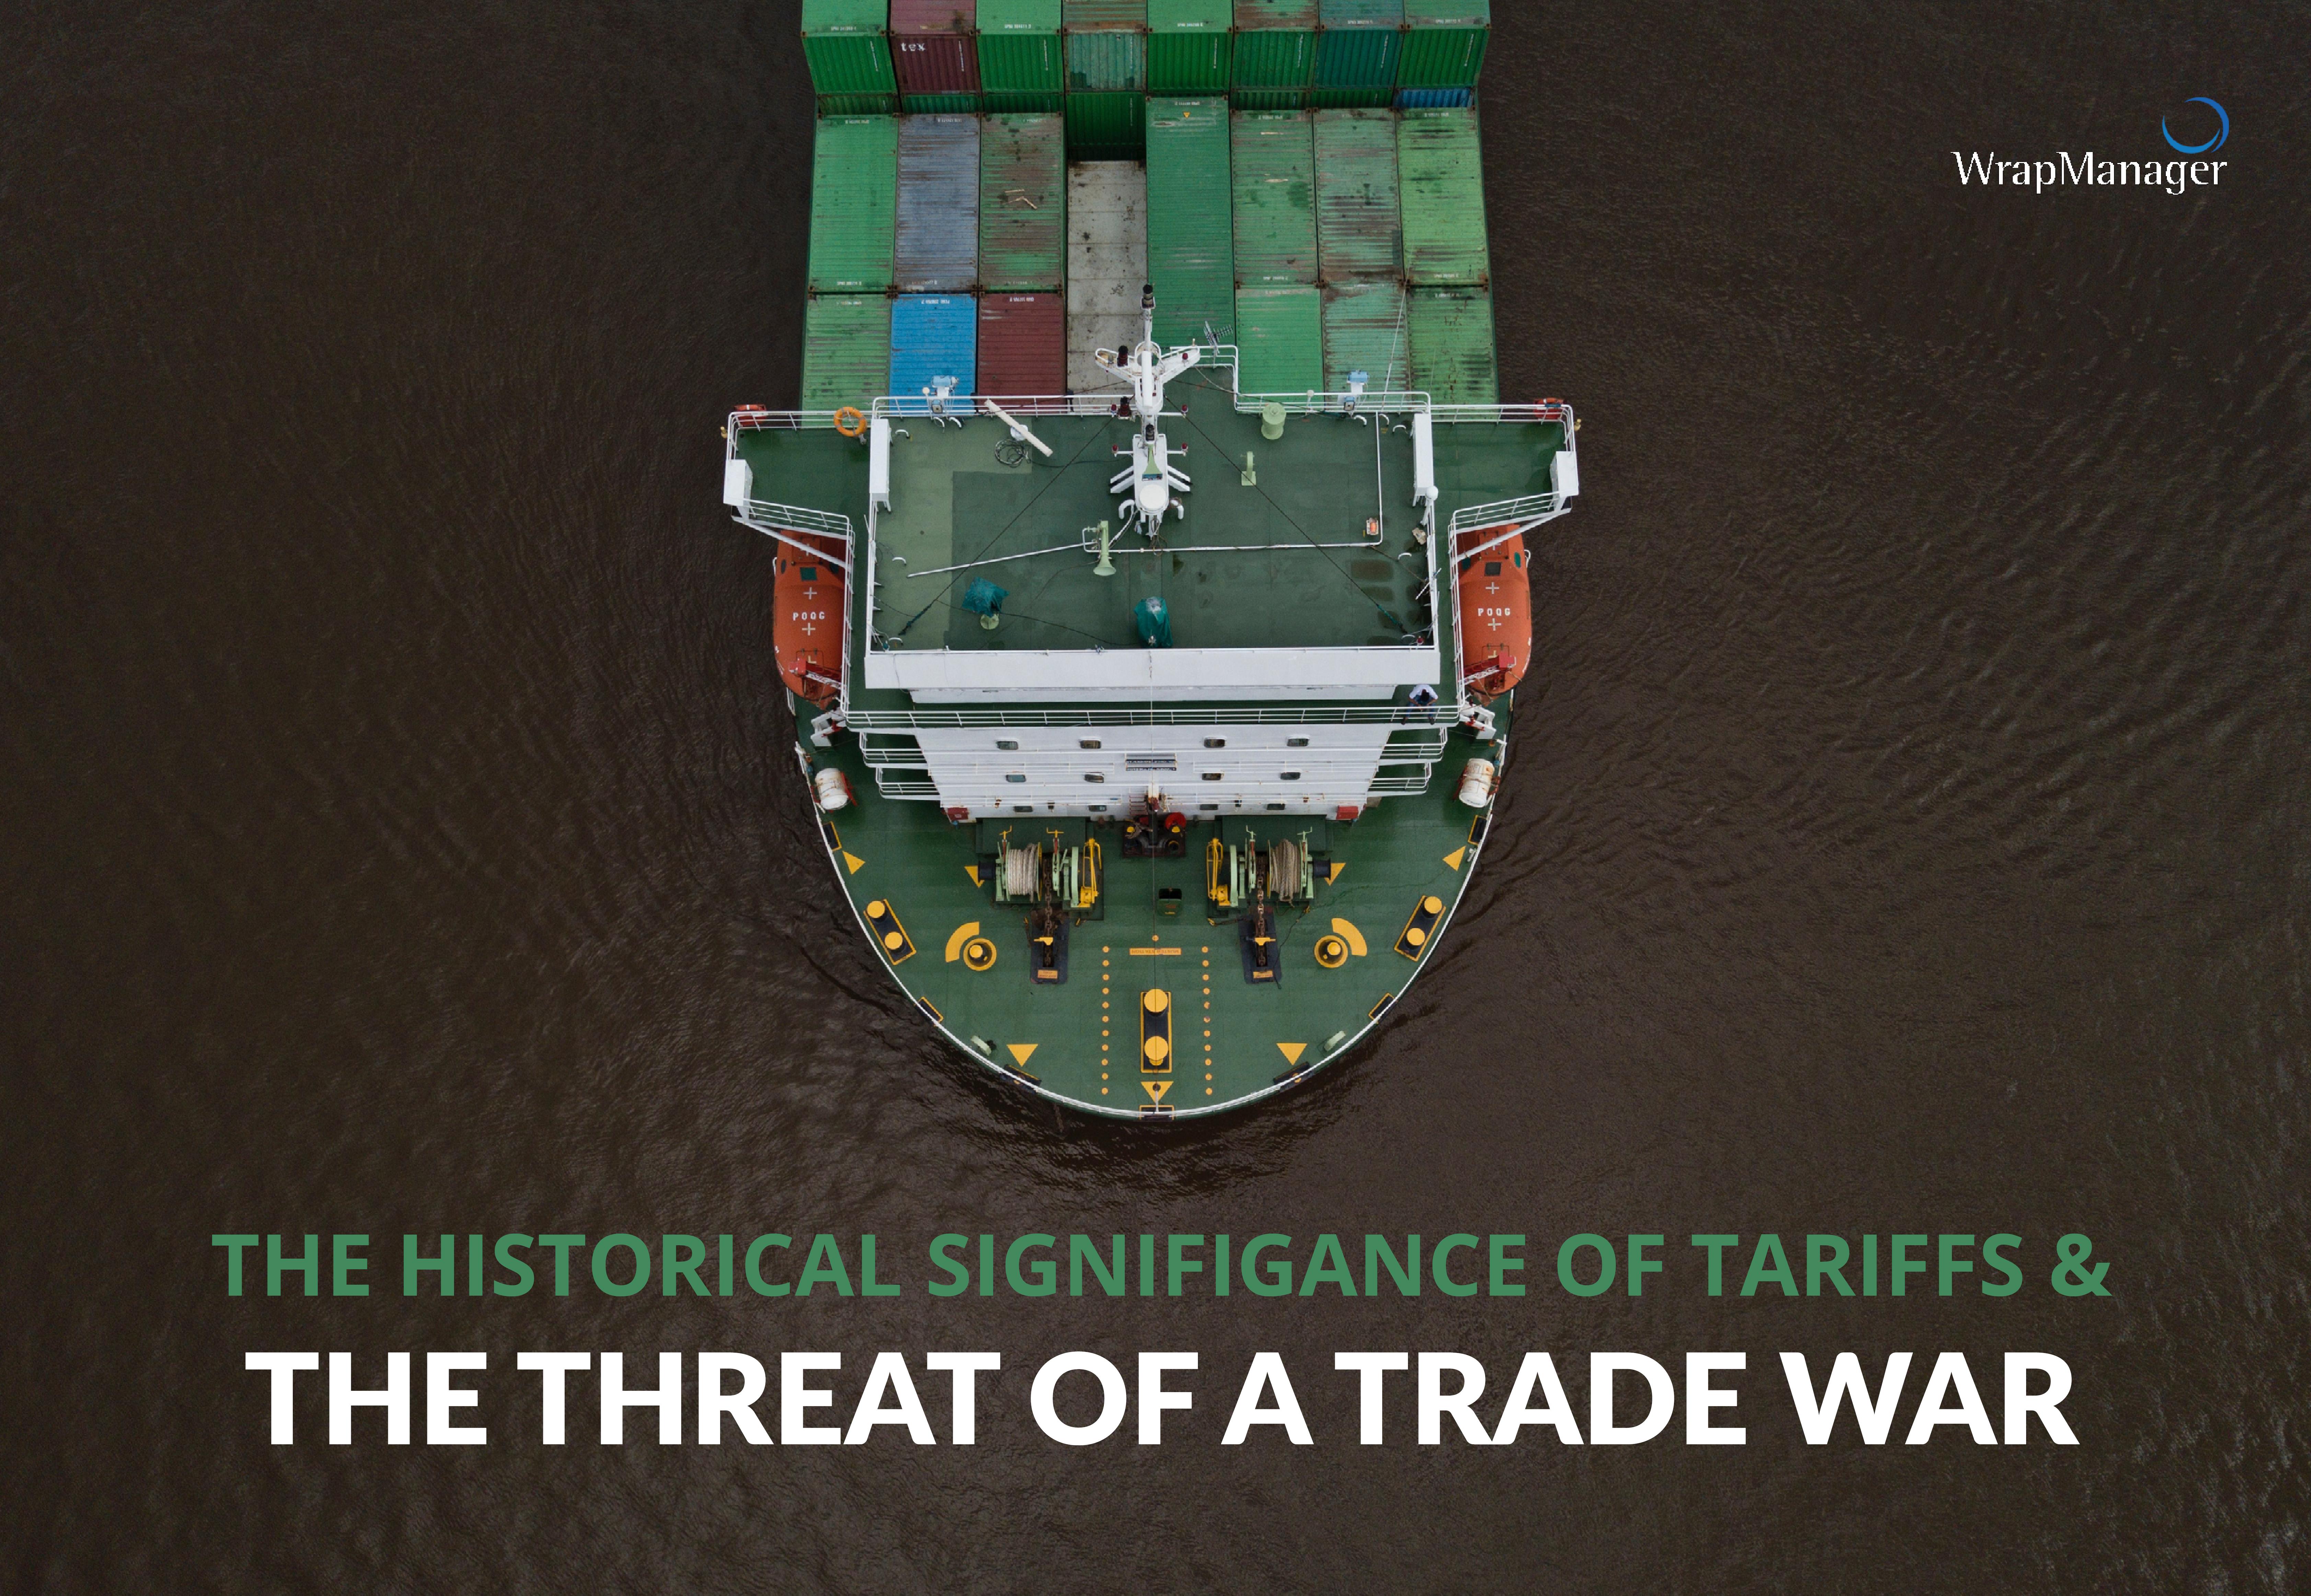 Tariffs and Trade Wars